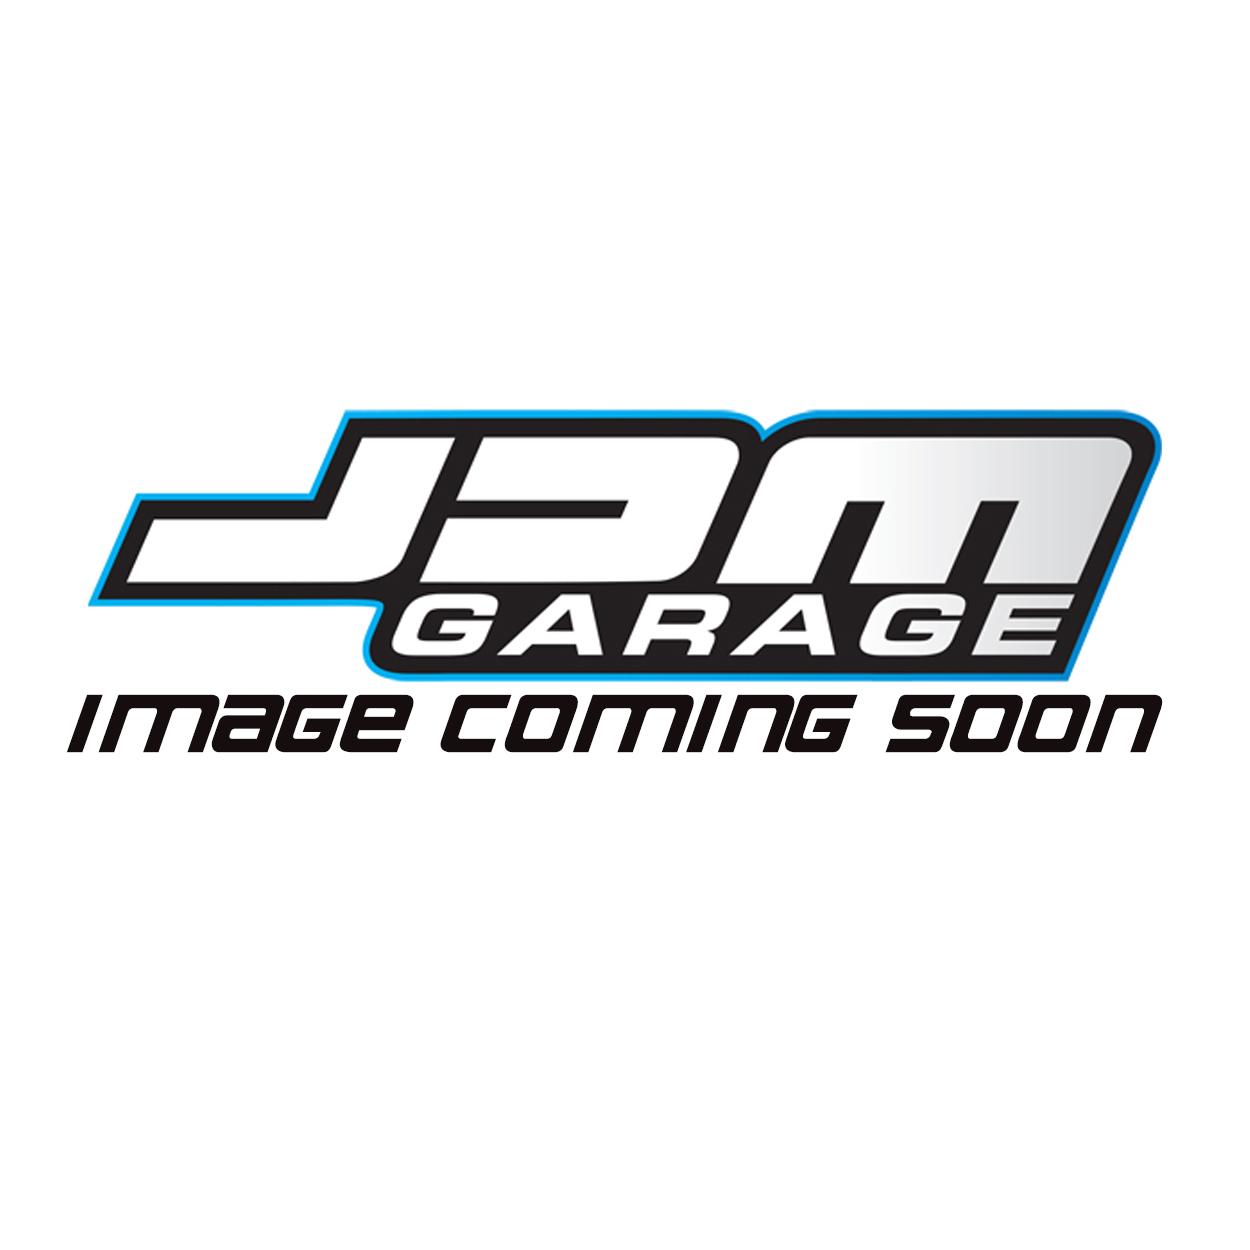 Genuine Nissan King Pin Bearing Set with Seals For Nissan Skyline R32 R33 GTS-T R34 GTT R32 R33 R34 GTR